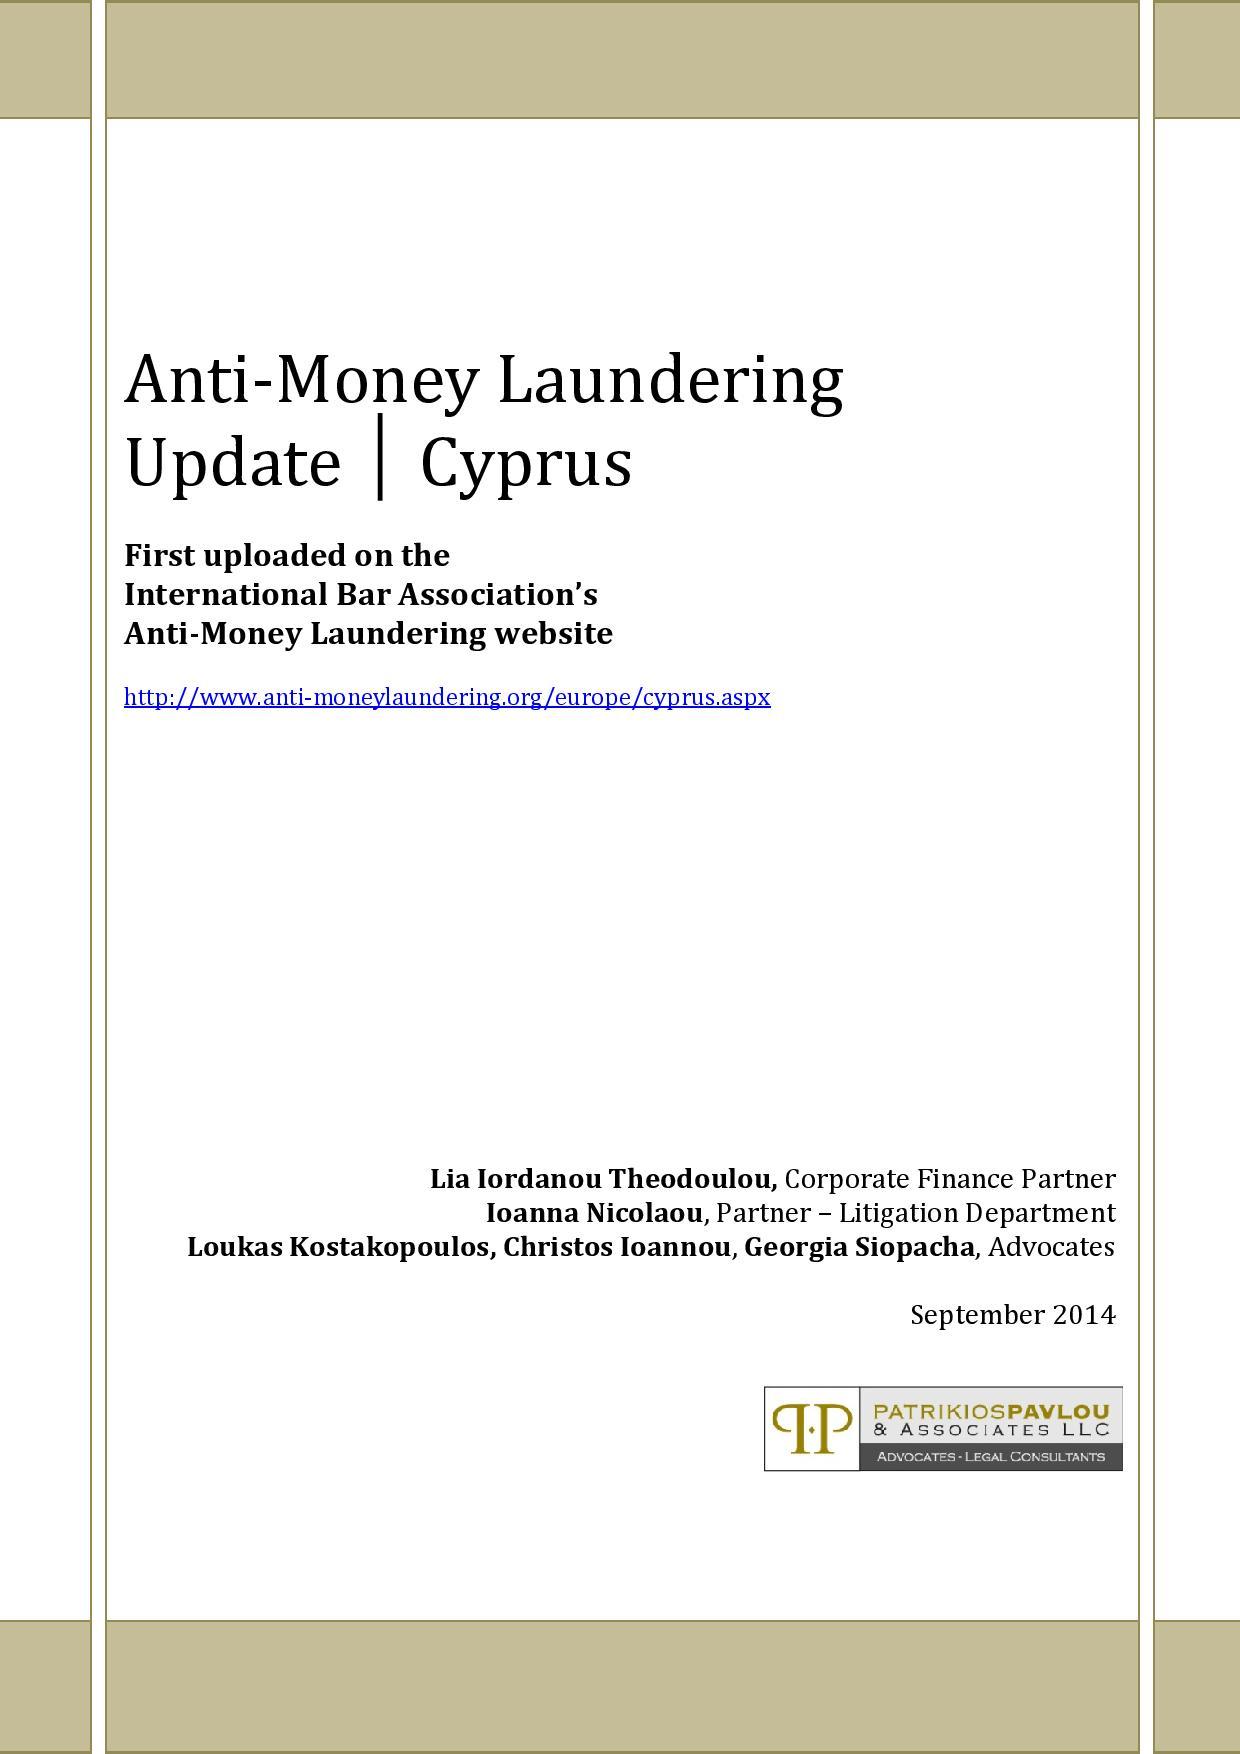 Anti-Money Laundering Update - Cyprus, September 2014